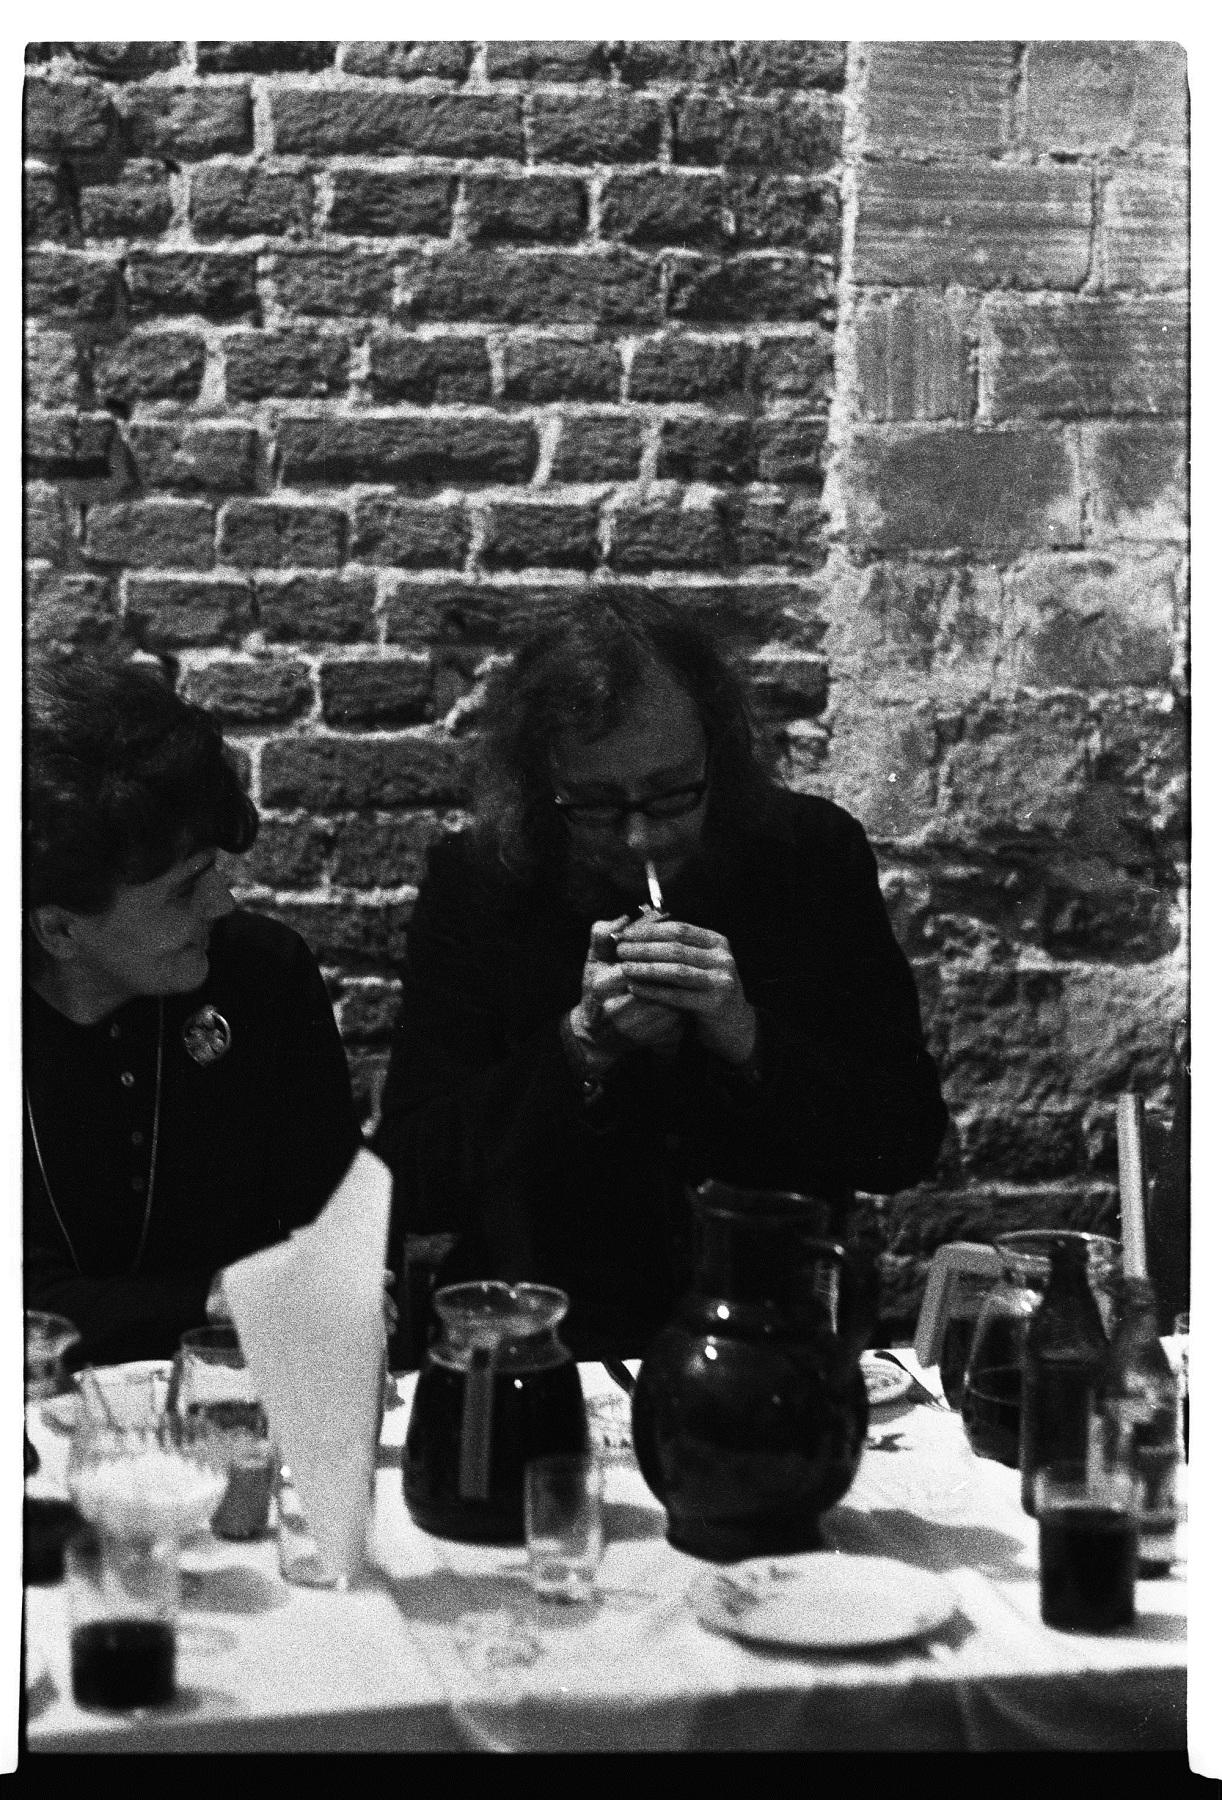 Dwudziestolecie Teatru Laboratorium, 1976, fot. Jan Krzysztof Fiołek (źródło: materiały prasowe organizatora)